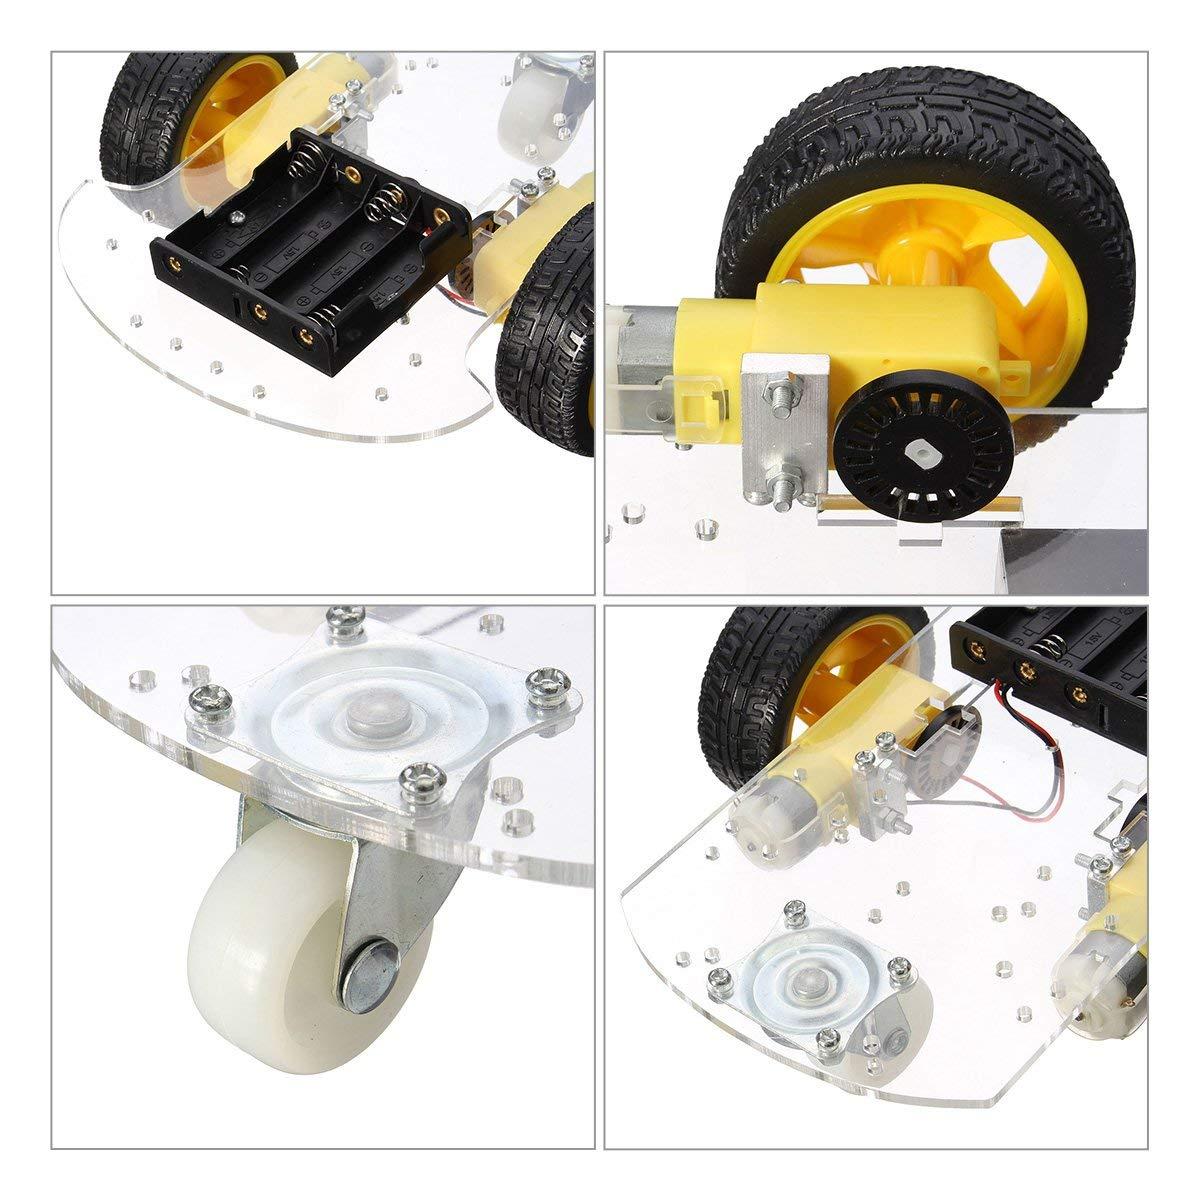 Ruota Omnidirezionale Arduino Kit Robot Macchina Smart Car 2WD